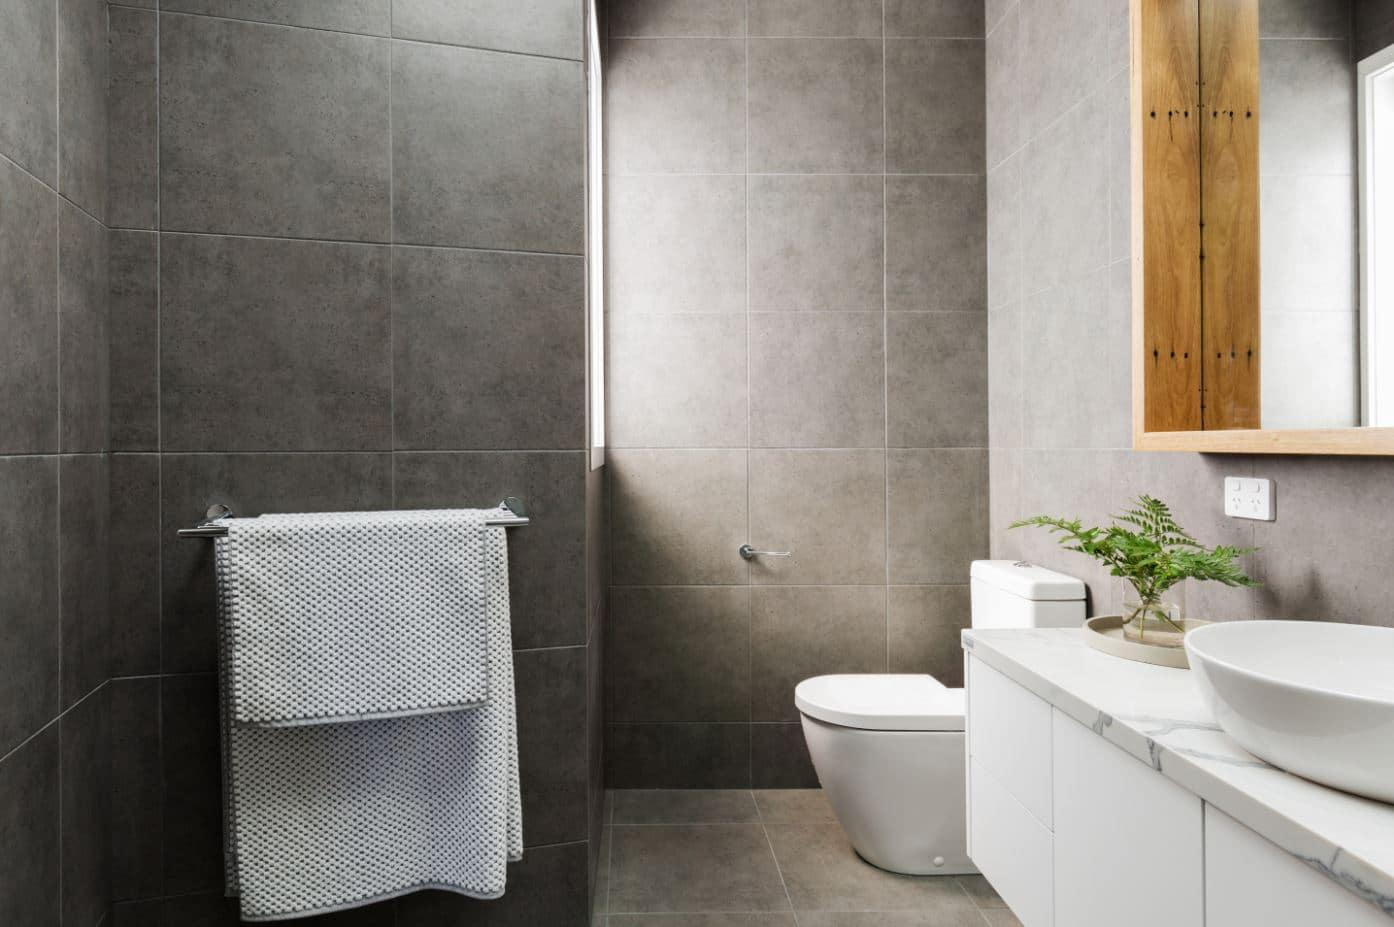 Bathroom renovation in Western Sydney with a charcoal grey design